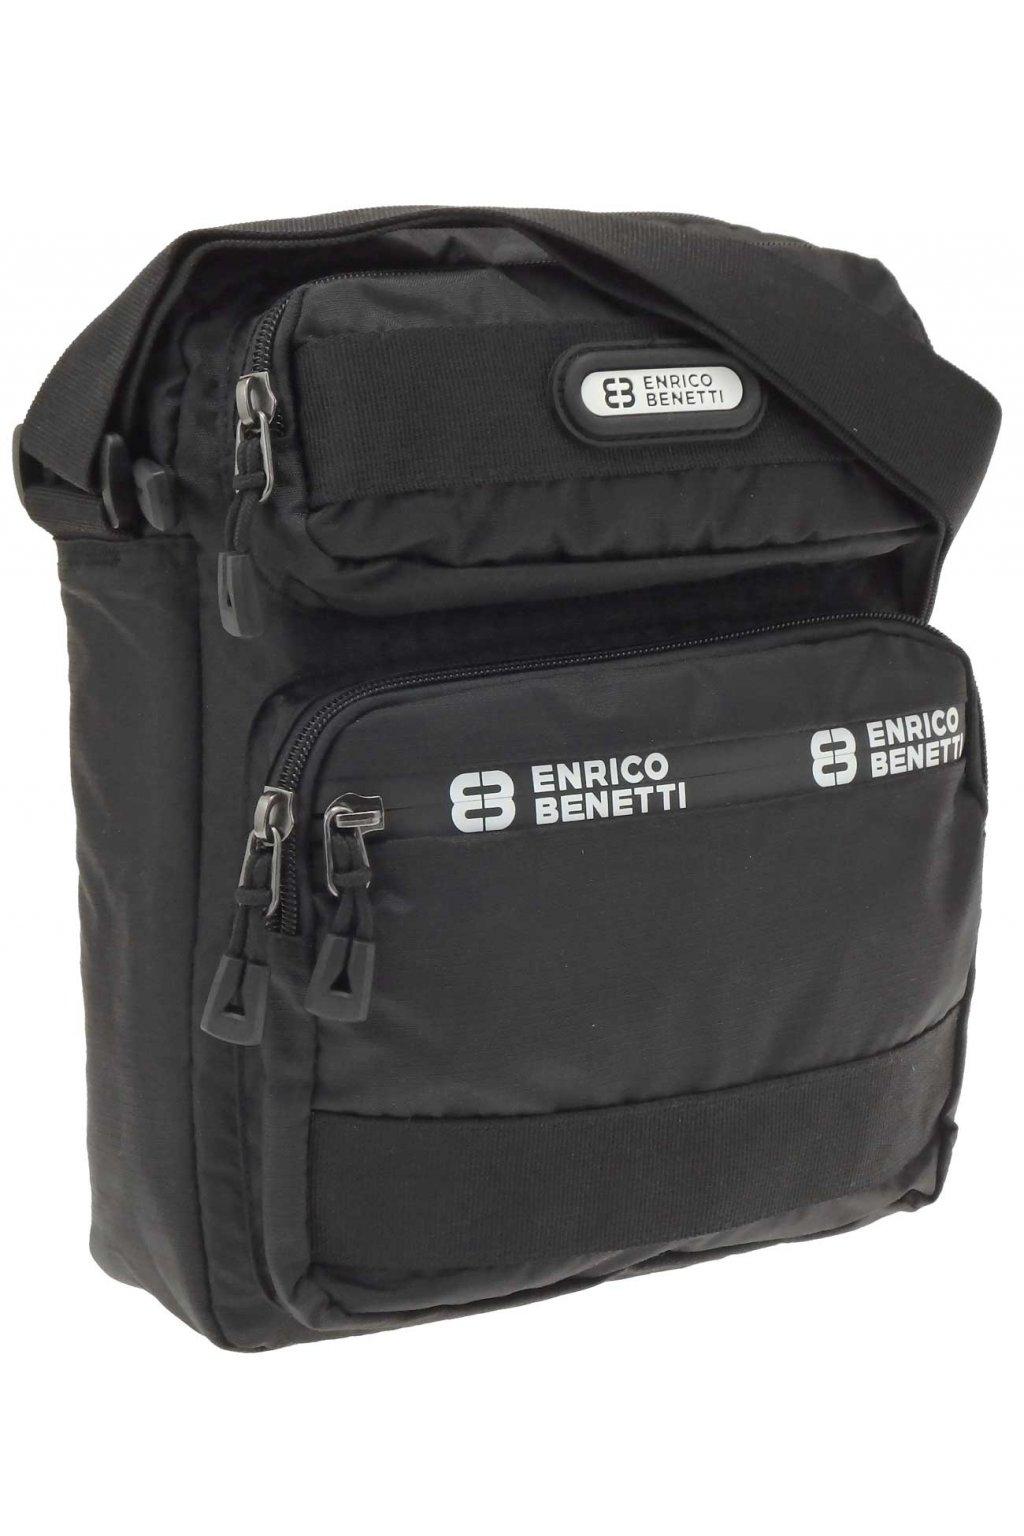 panska textilní taška tt03 62091 c